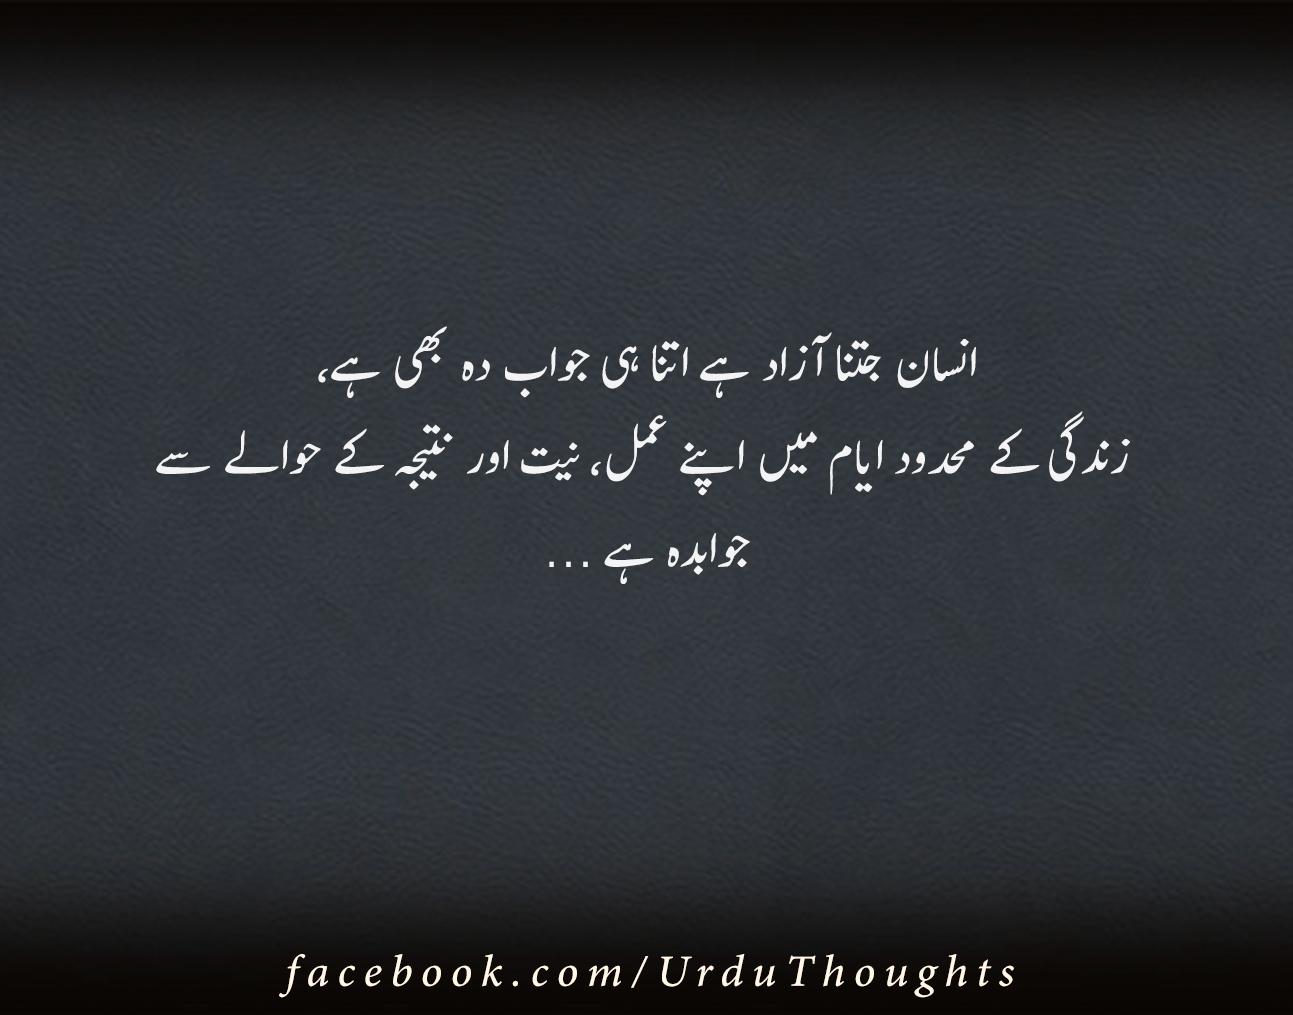 Beautiful Urdu Quotes For Facebook Instagram Whatsapp ...